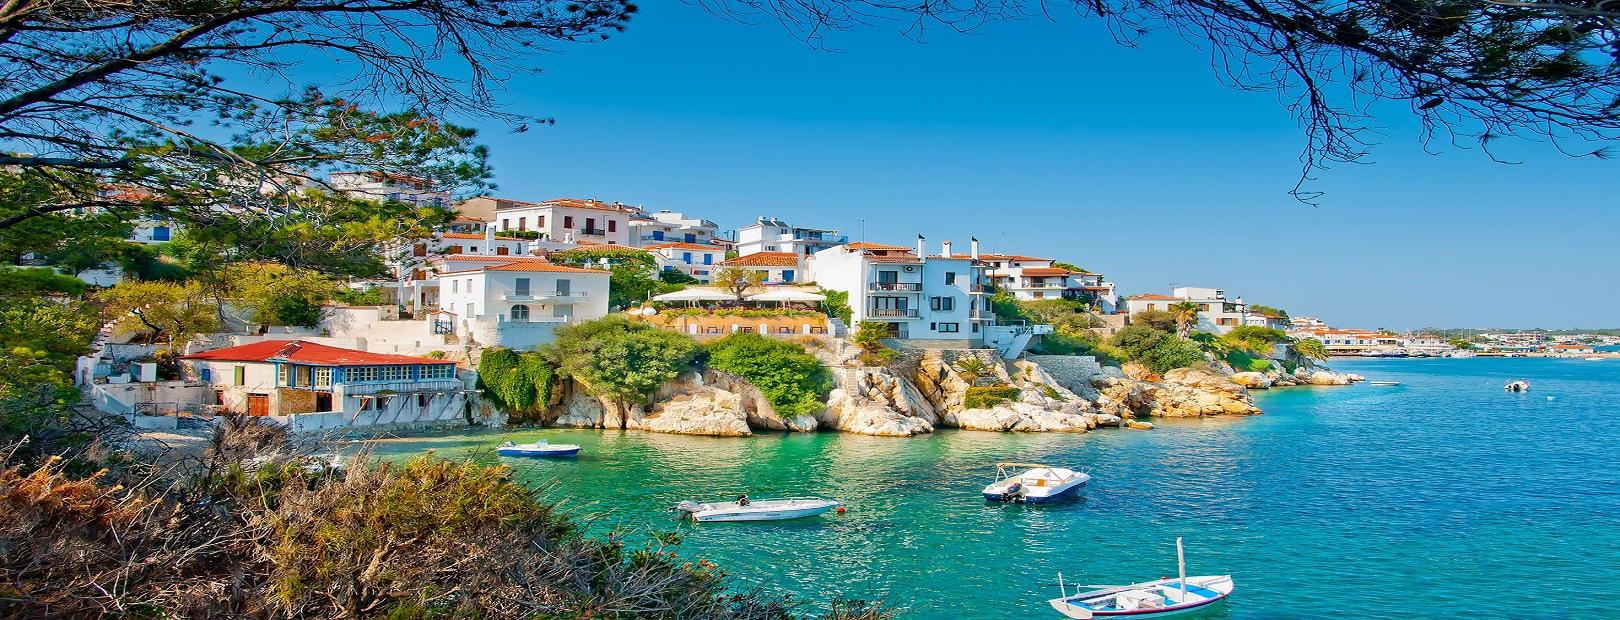 Offerta pacchetti vacanze a Skiathos